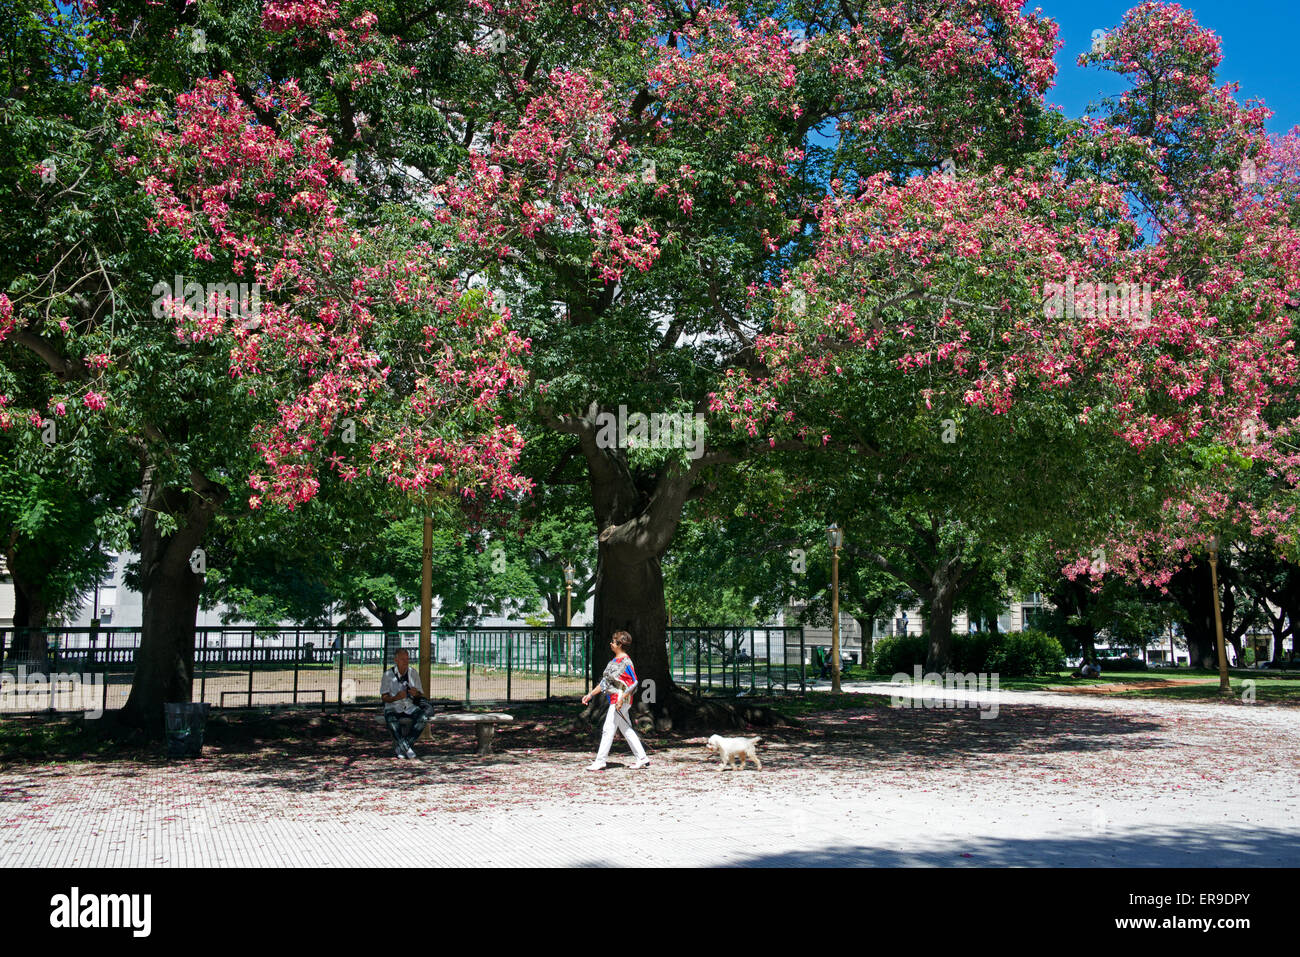 Trees in blossom Plaza San Martin Retiro Buenos Aires Argentina - Stock Image